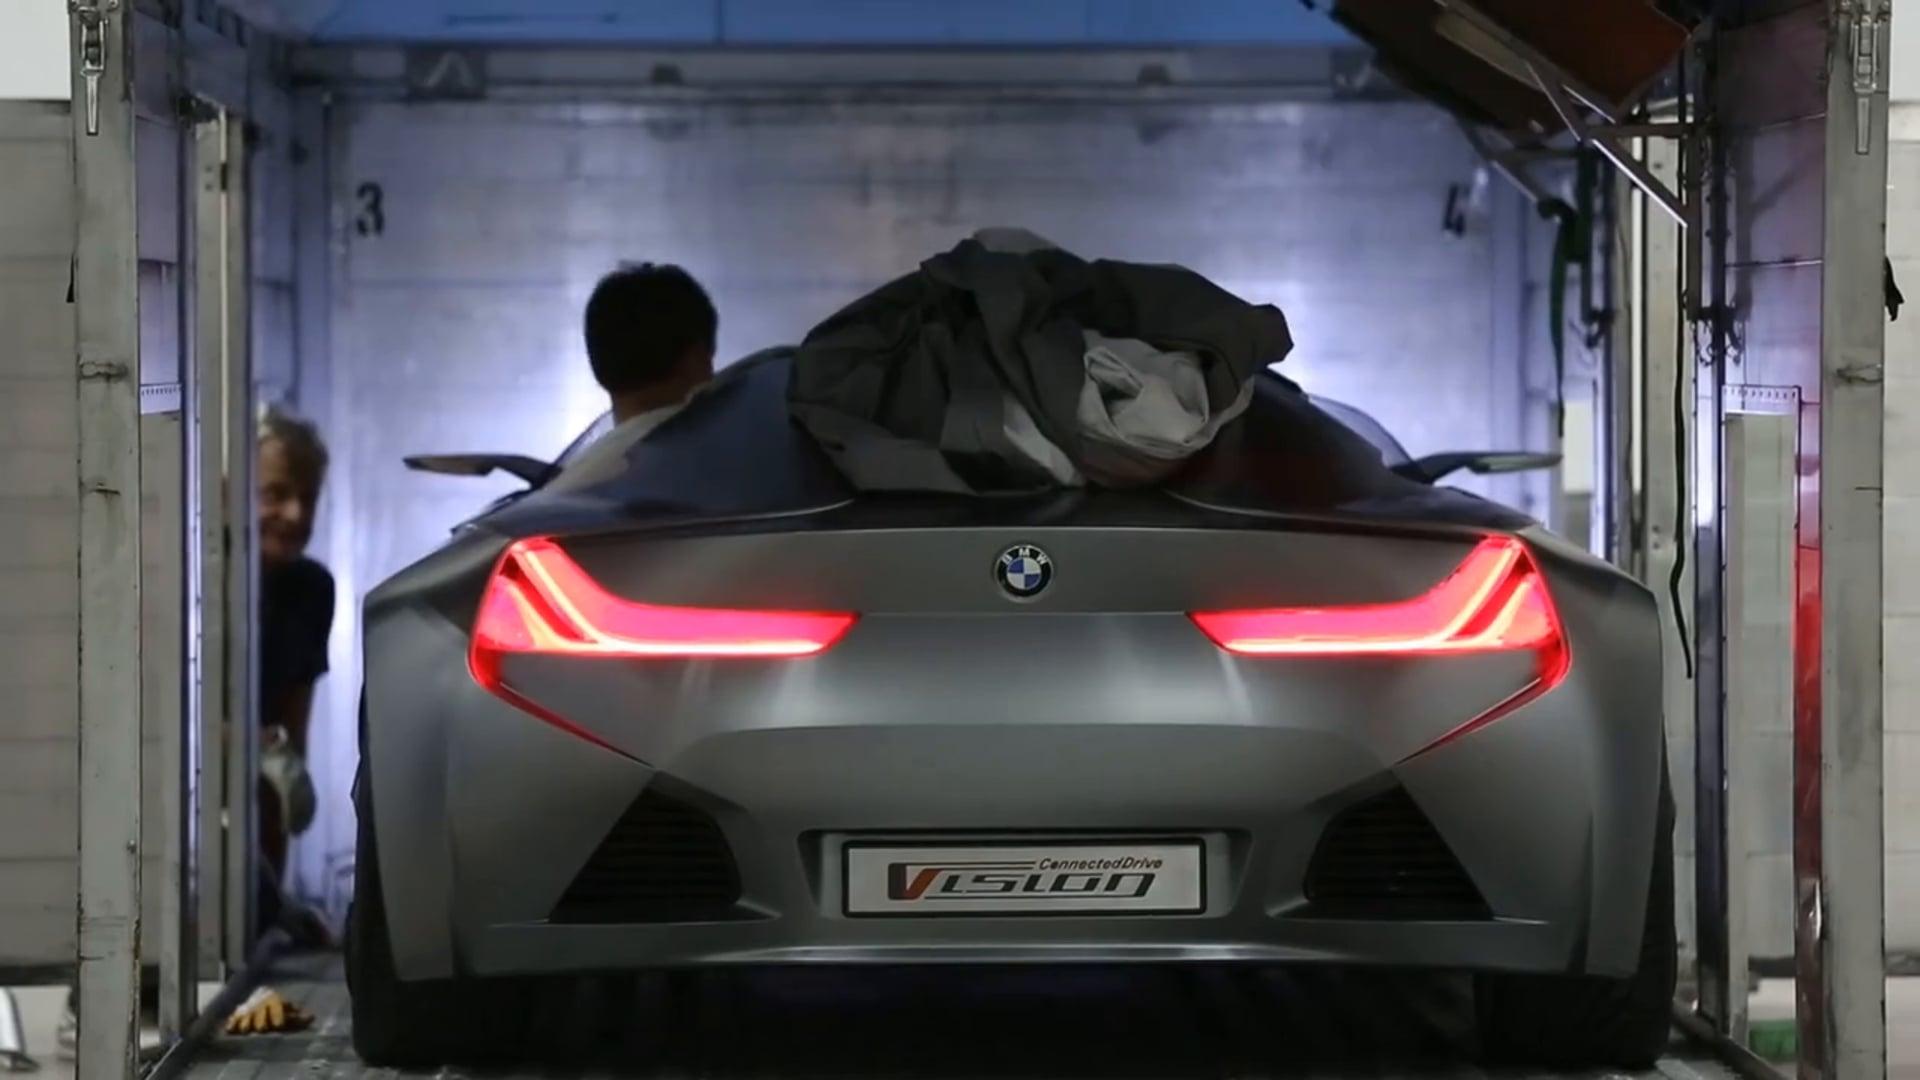 BMW World Event Singapore 2014